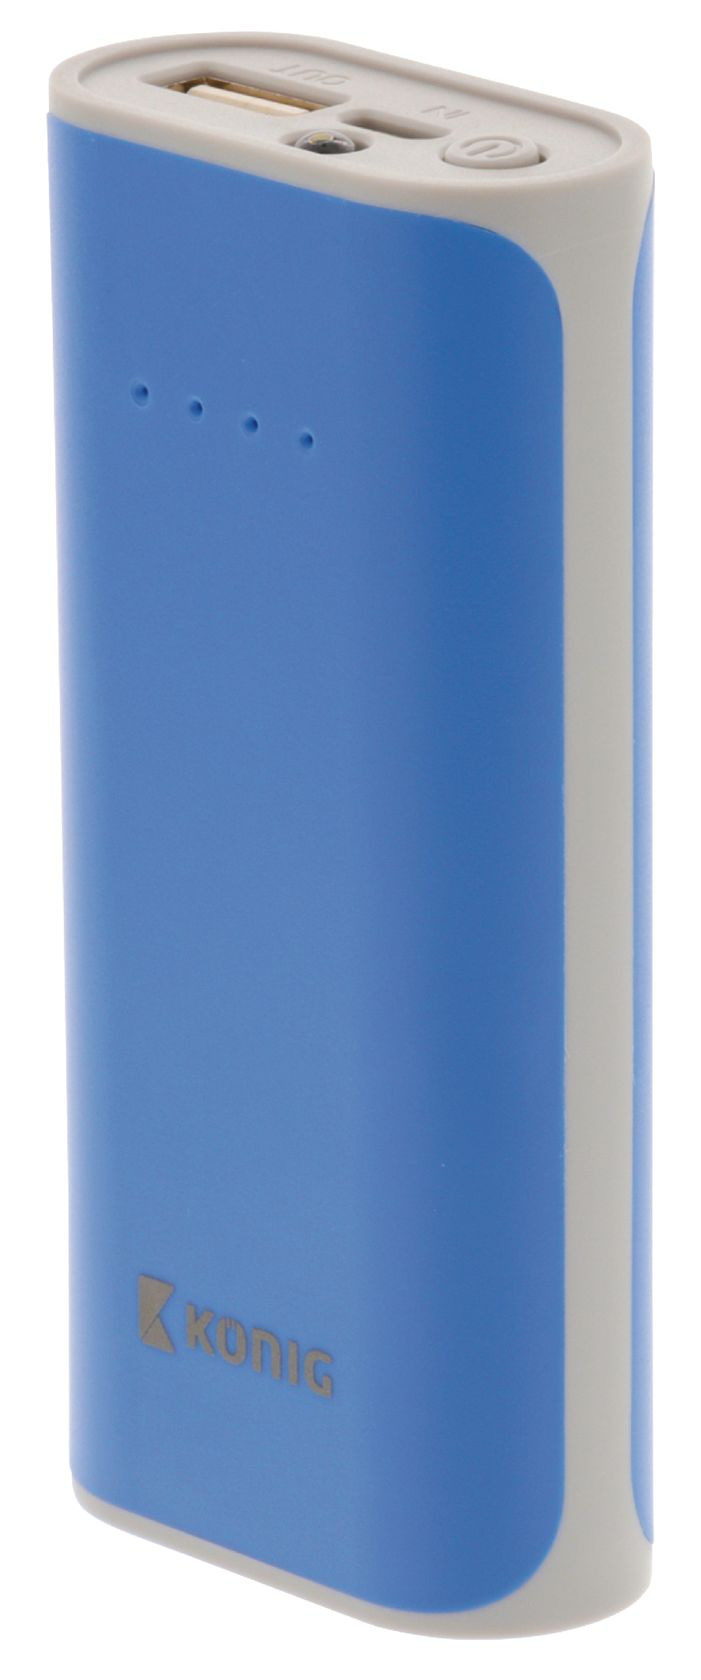 Draagbare Powerbank 5000 mAh USB Blauw